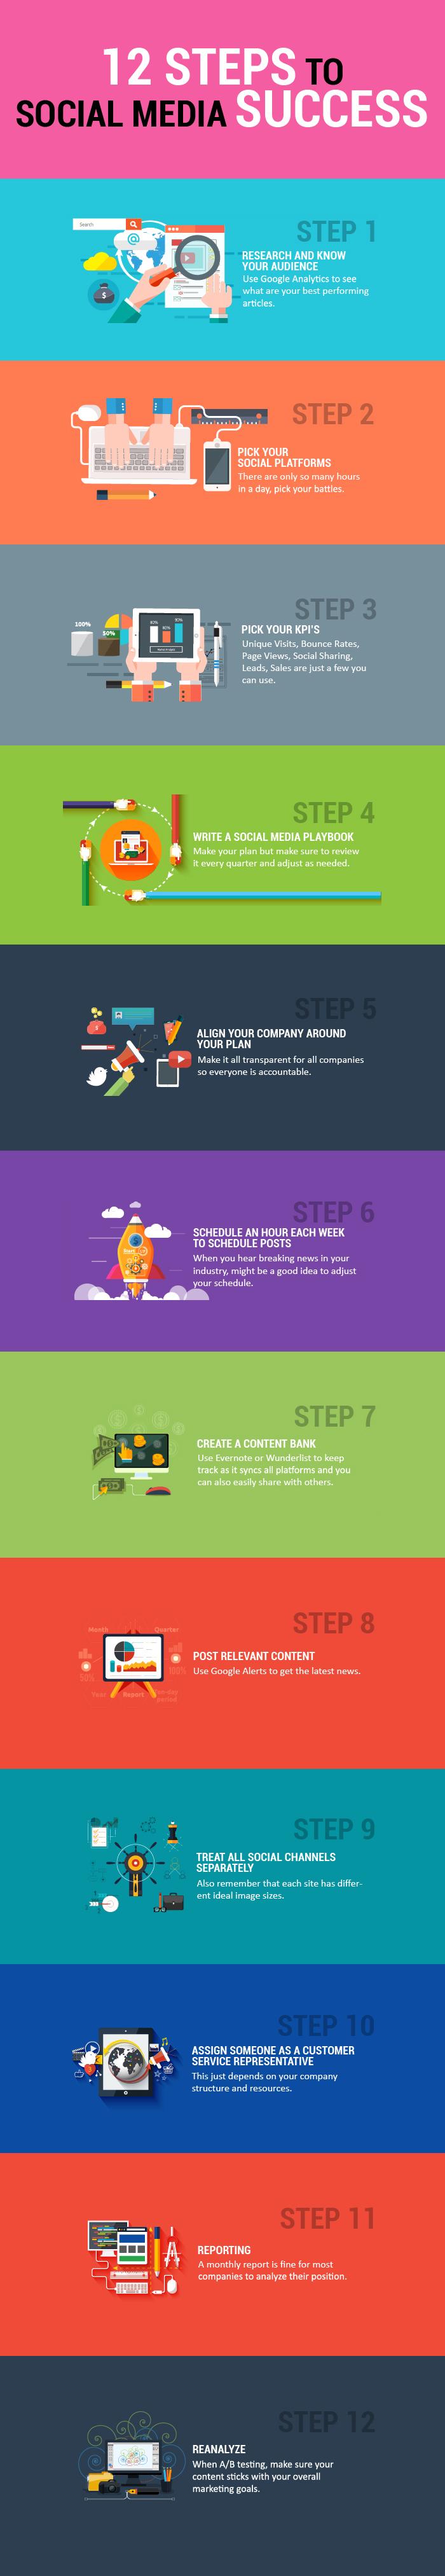 12 Steps to Social Media Marketing Success [Infographic]                      | Social Media Today